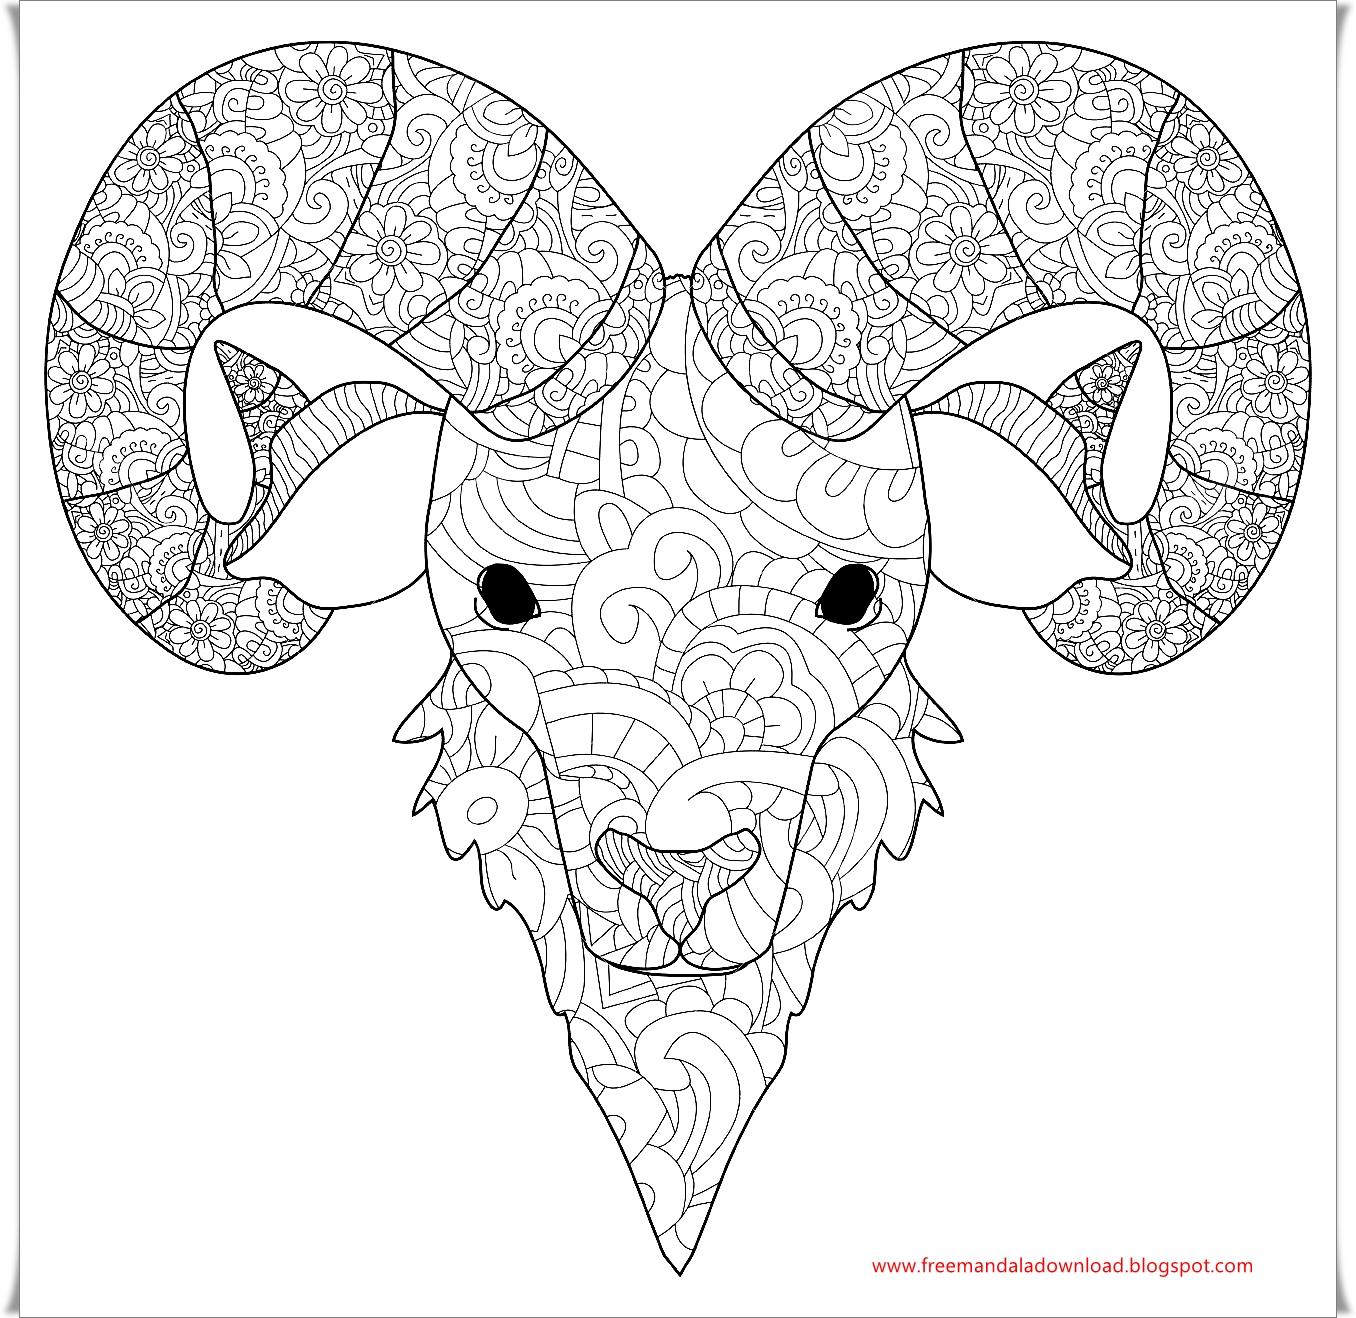 Schaf Mandala Download/Sheep mandala download - Free Mandala